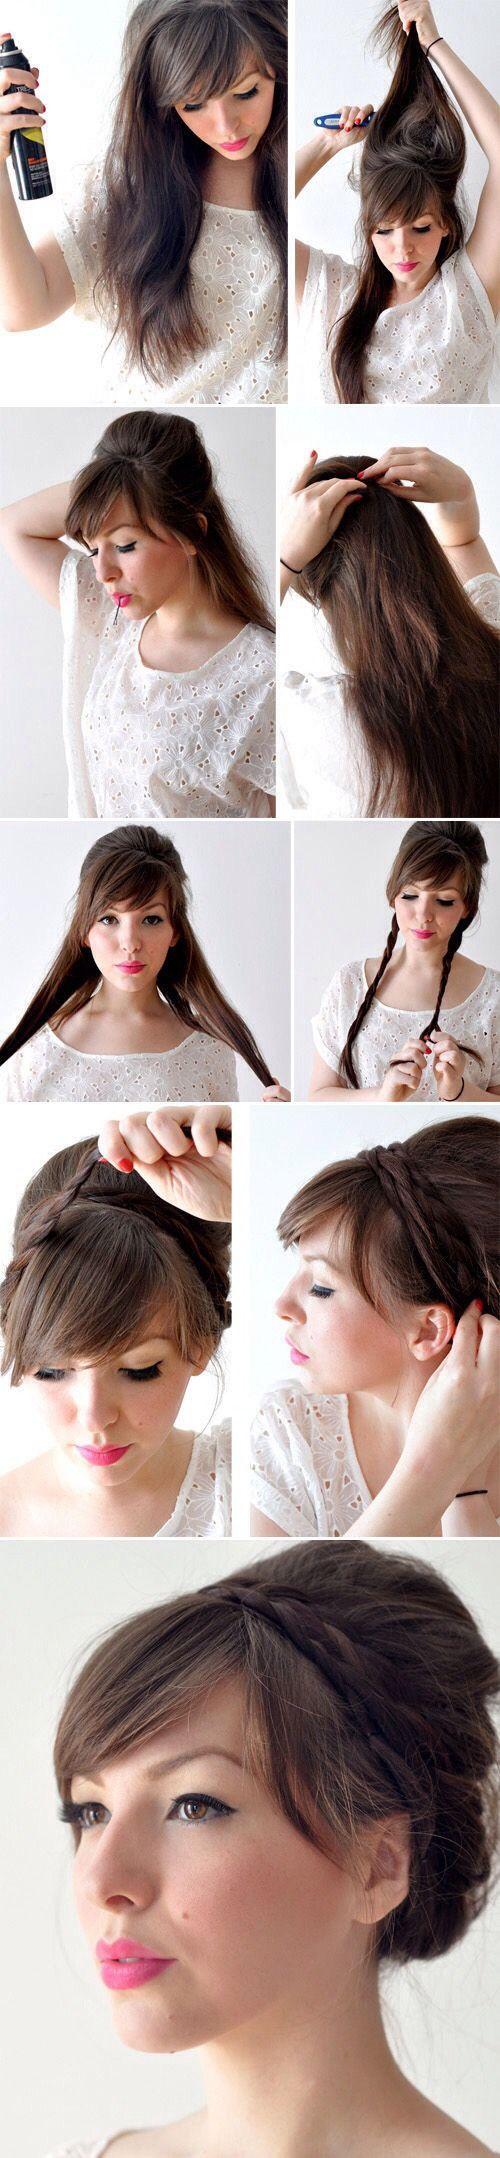 Simple, Elegant Up-do! So Pretty!